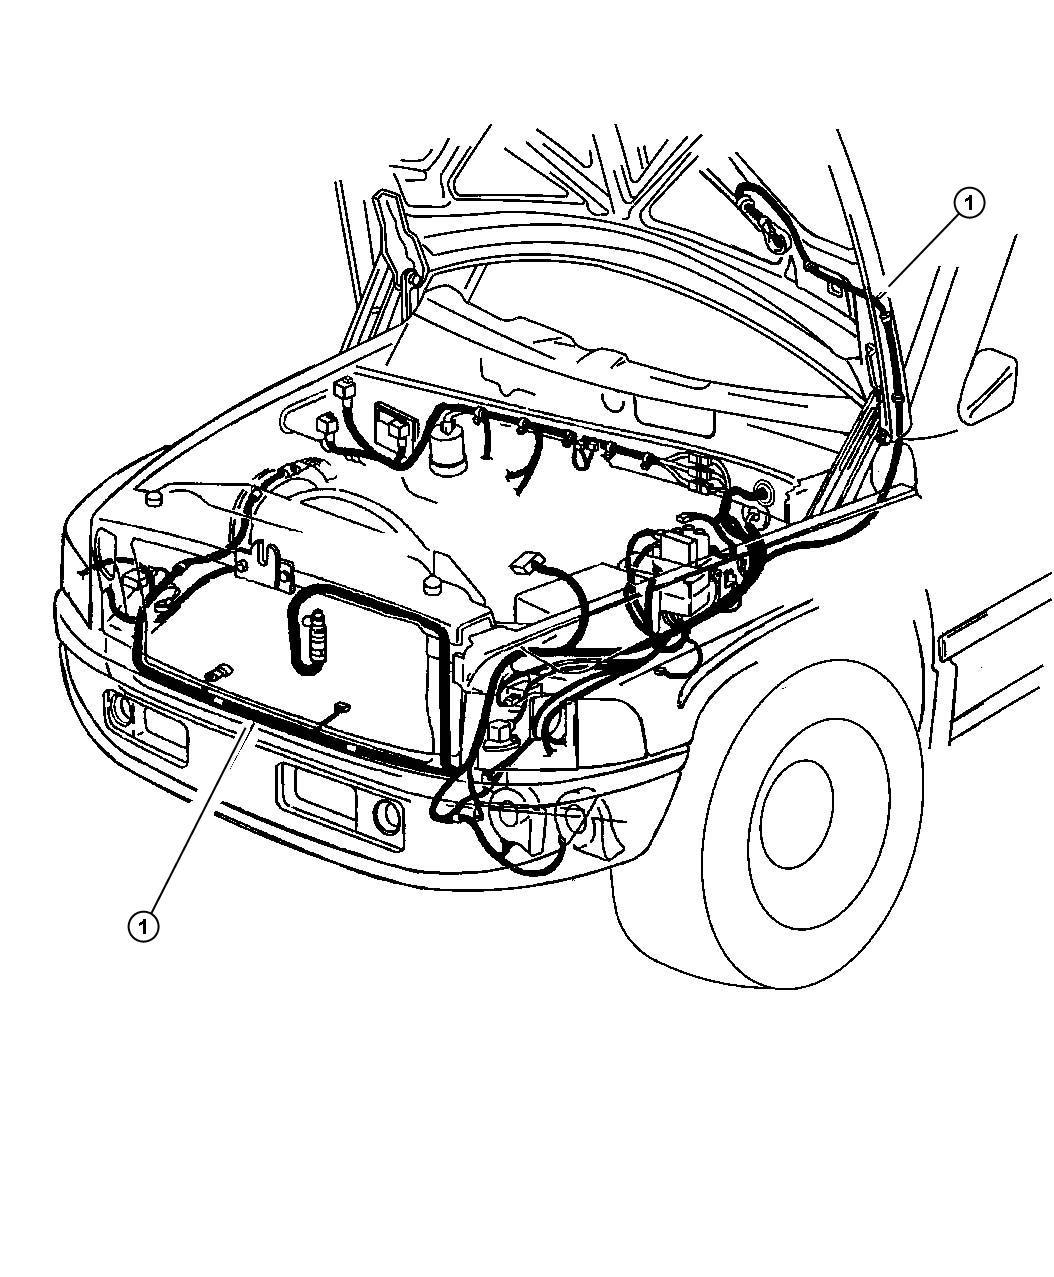 Dodge Ram Wiring Headlamp To Dash W Rwal W Rwal